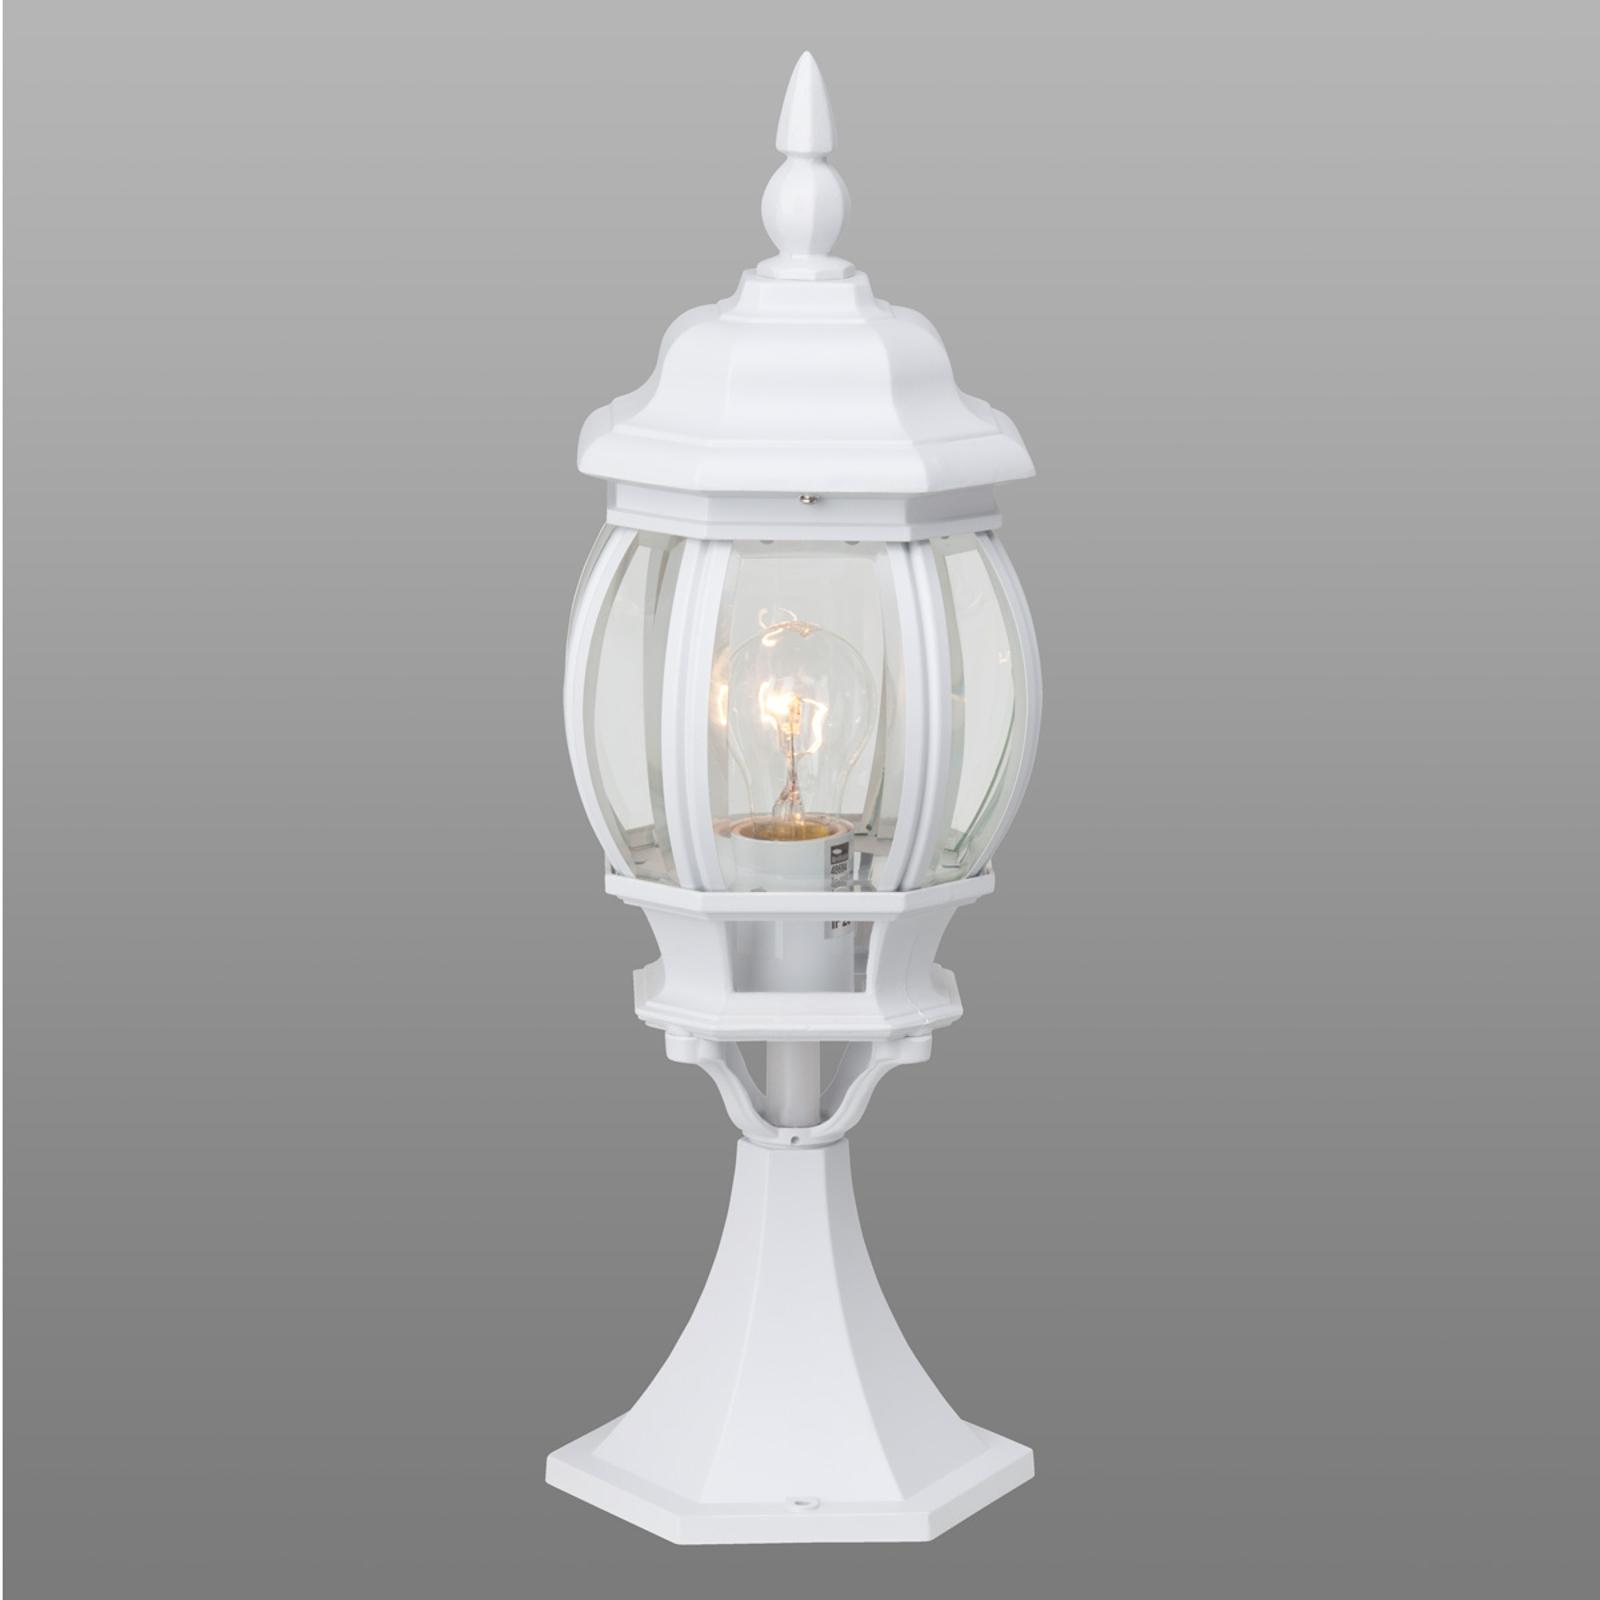 Biała lampa cokołowa ISTRIA